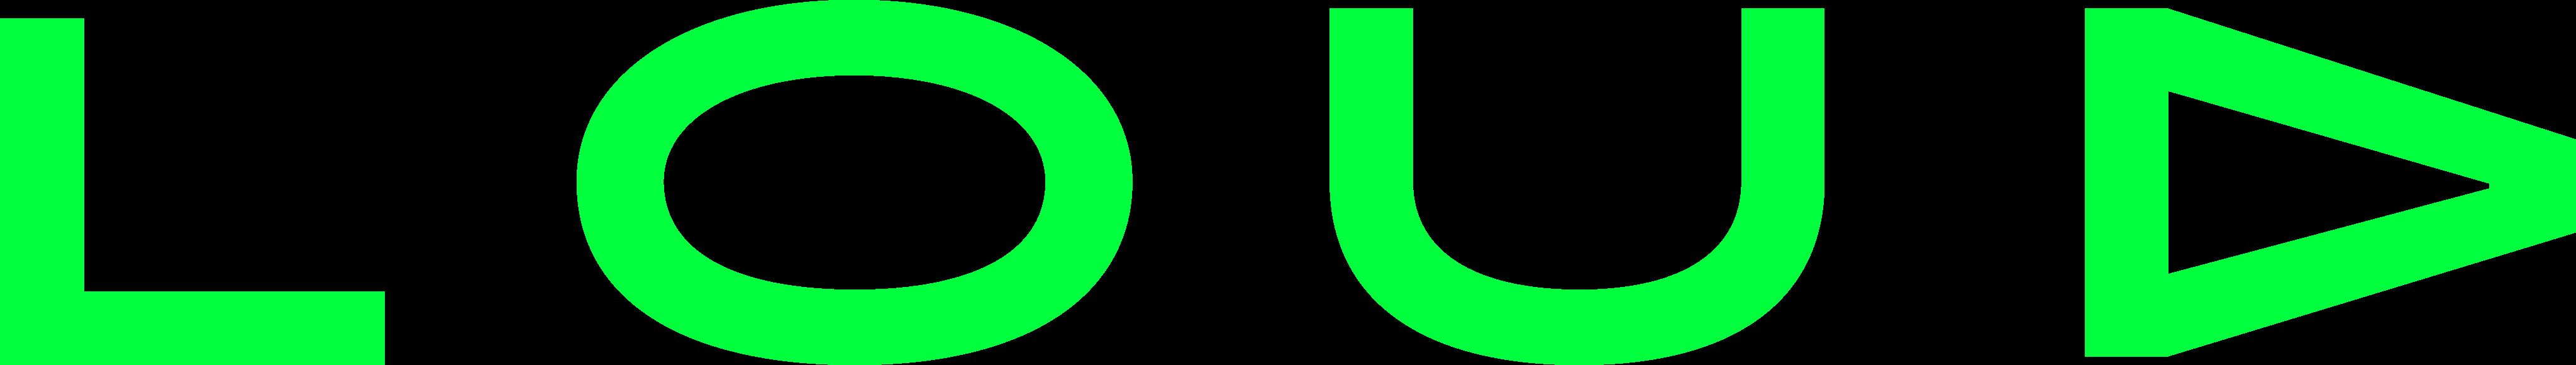 LOUD Logo.